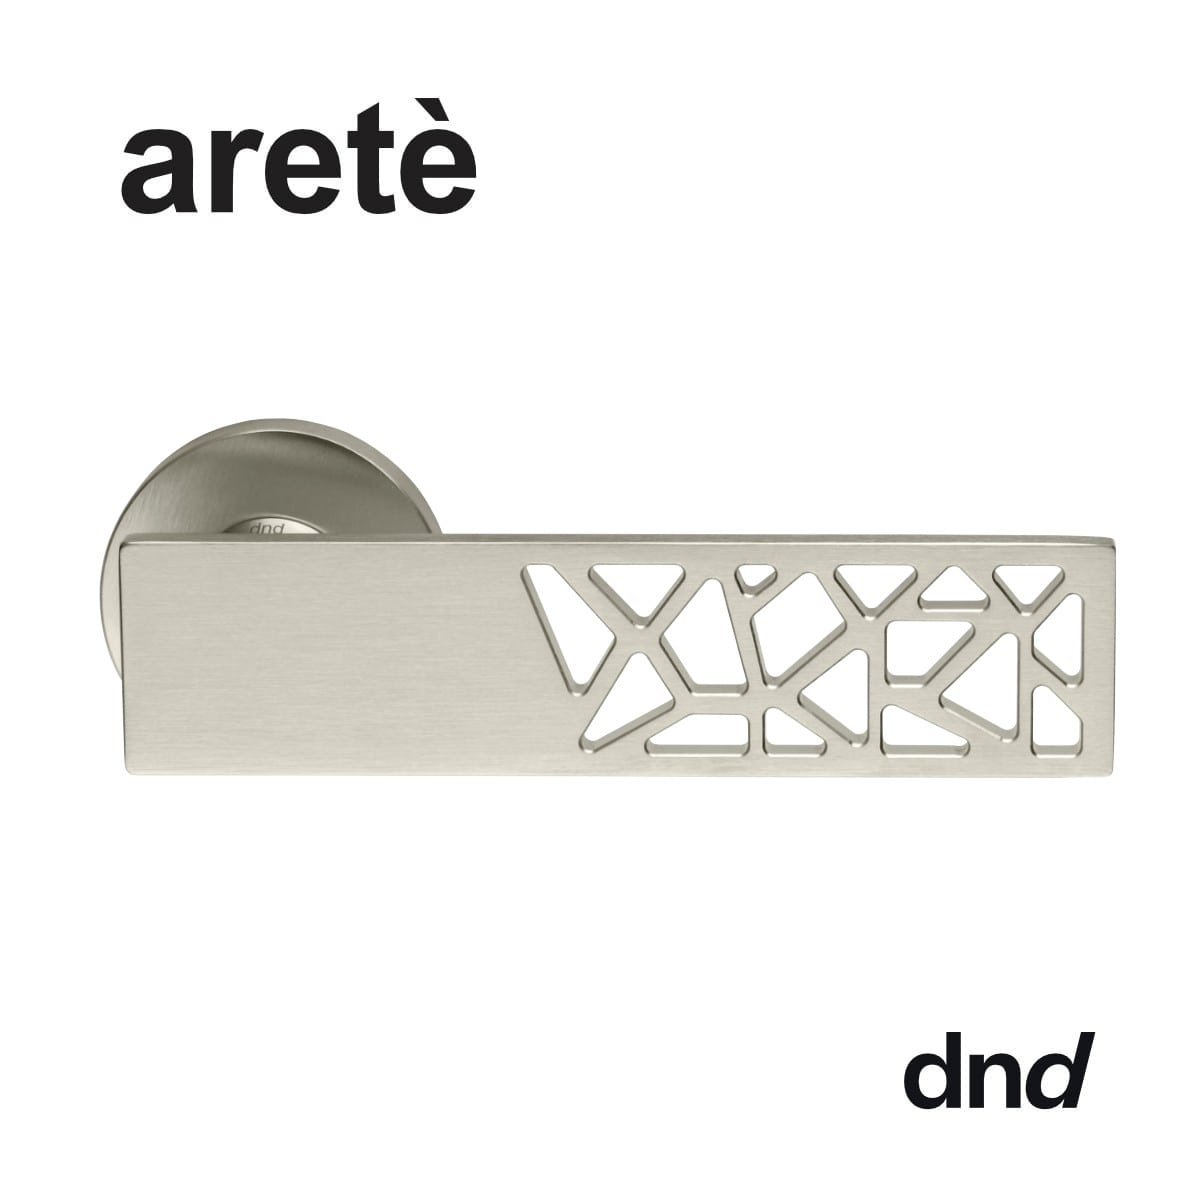 arete_pvx-min